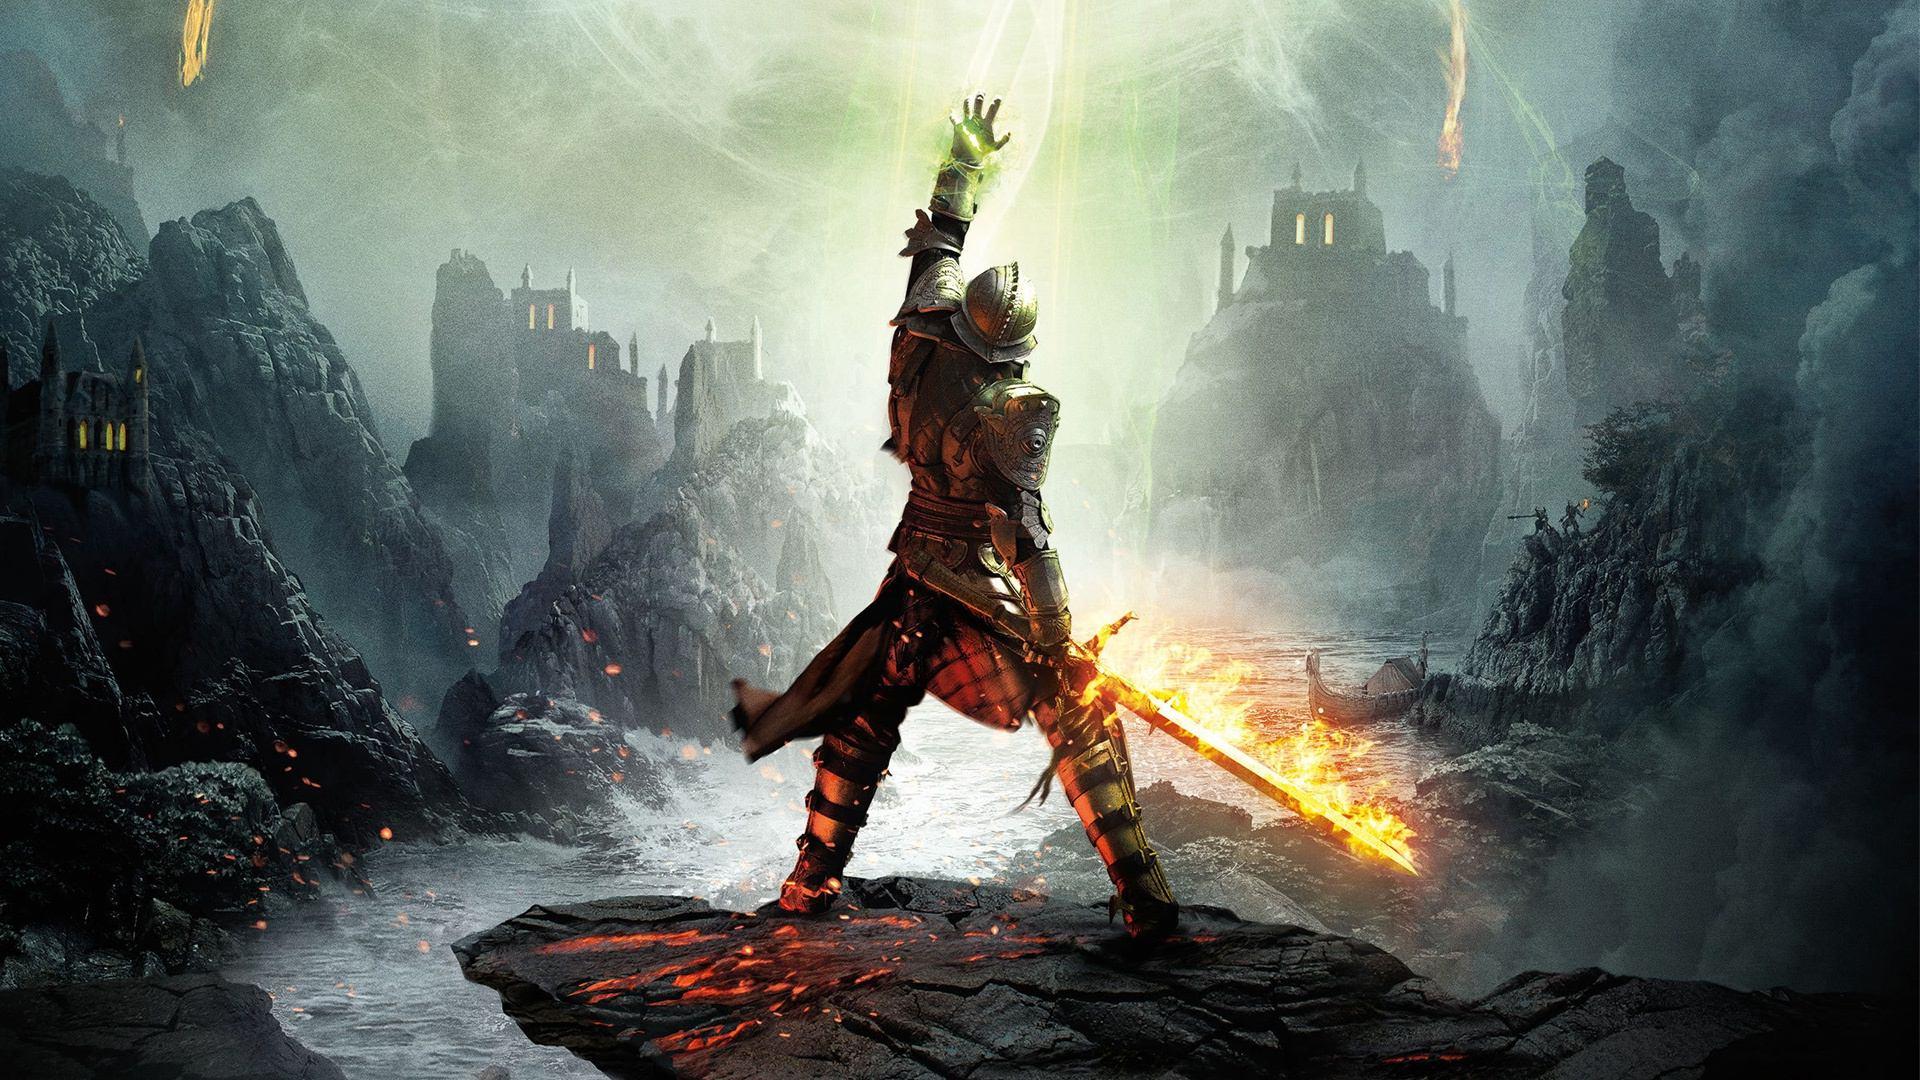 [PC] Обзор Dragon Age: Inquisition. - Изображение 1